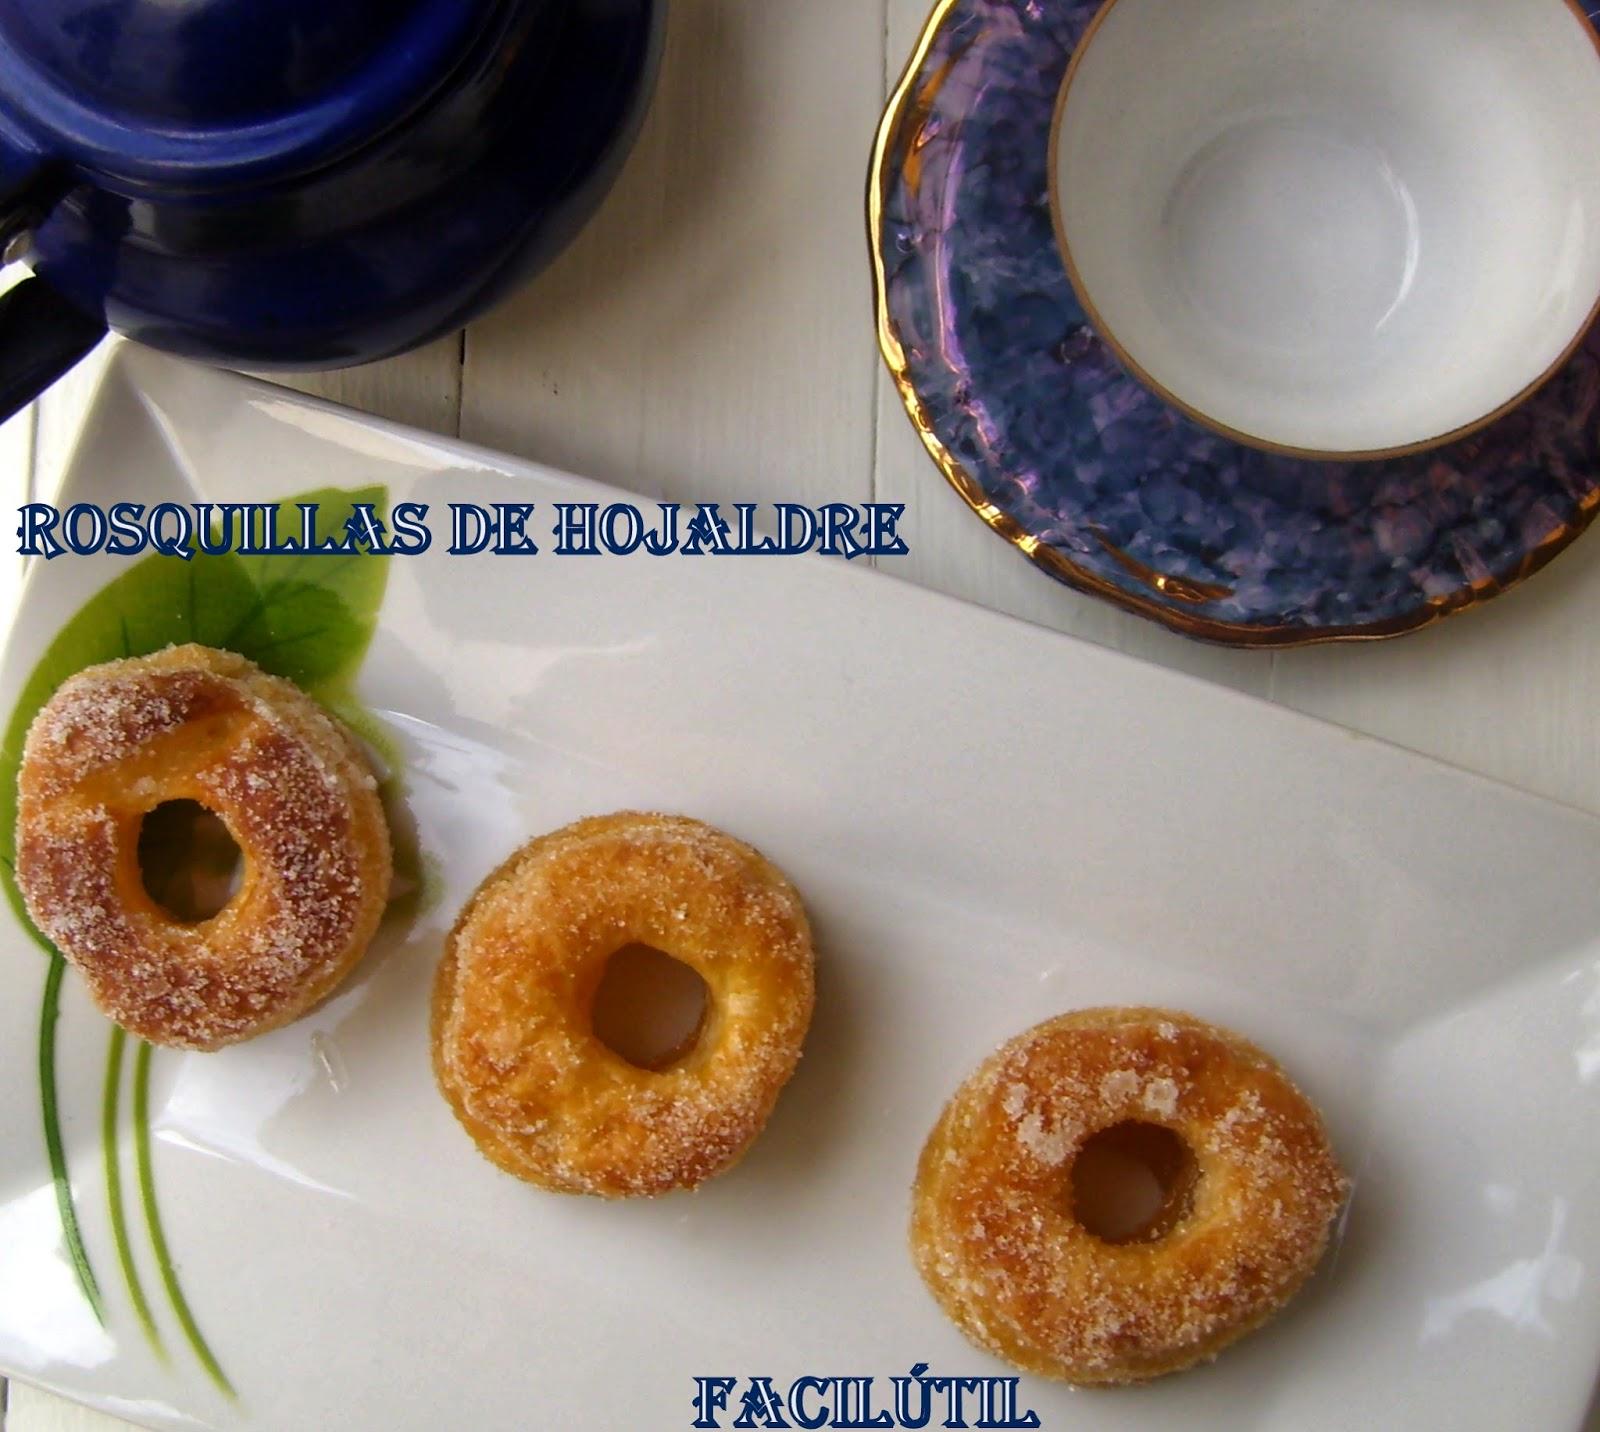 rosquillas-de-hojaldre-tipo--cristaleiro